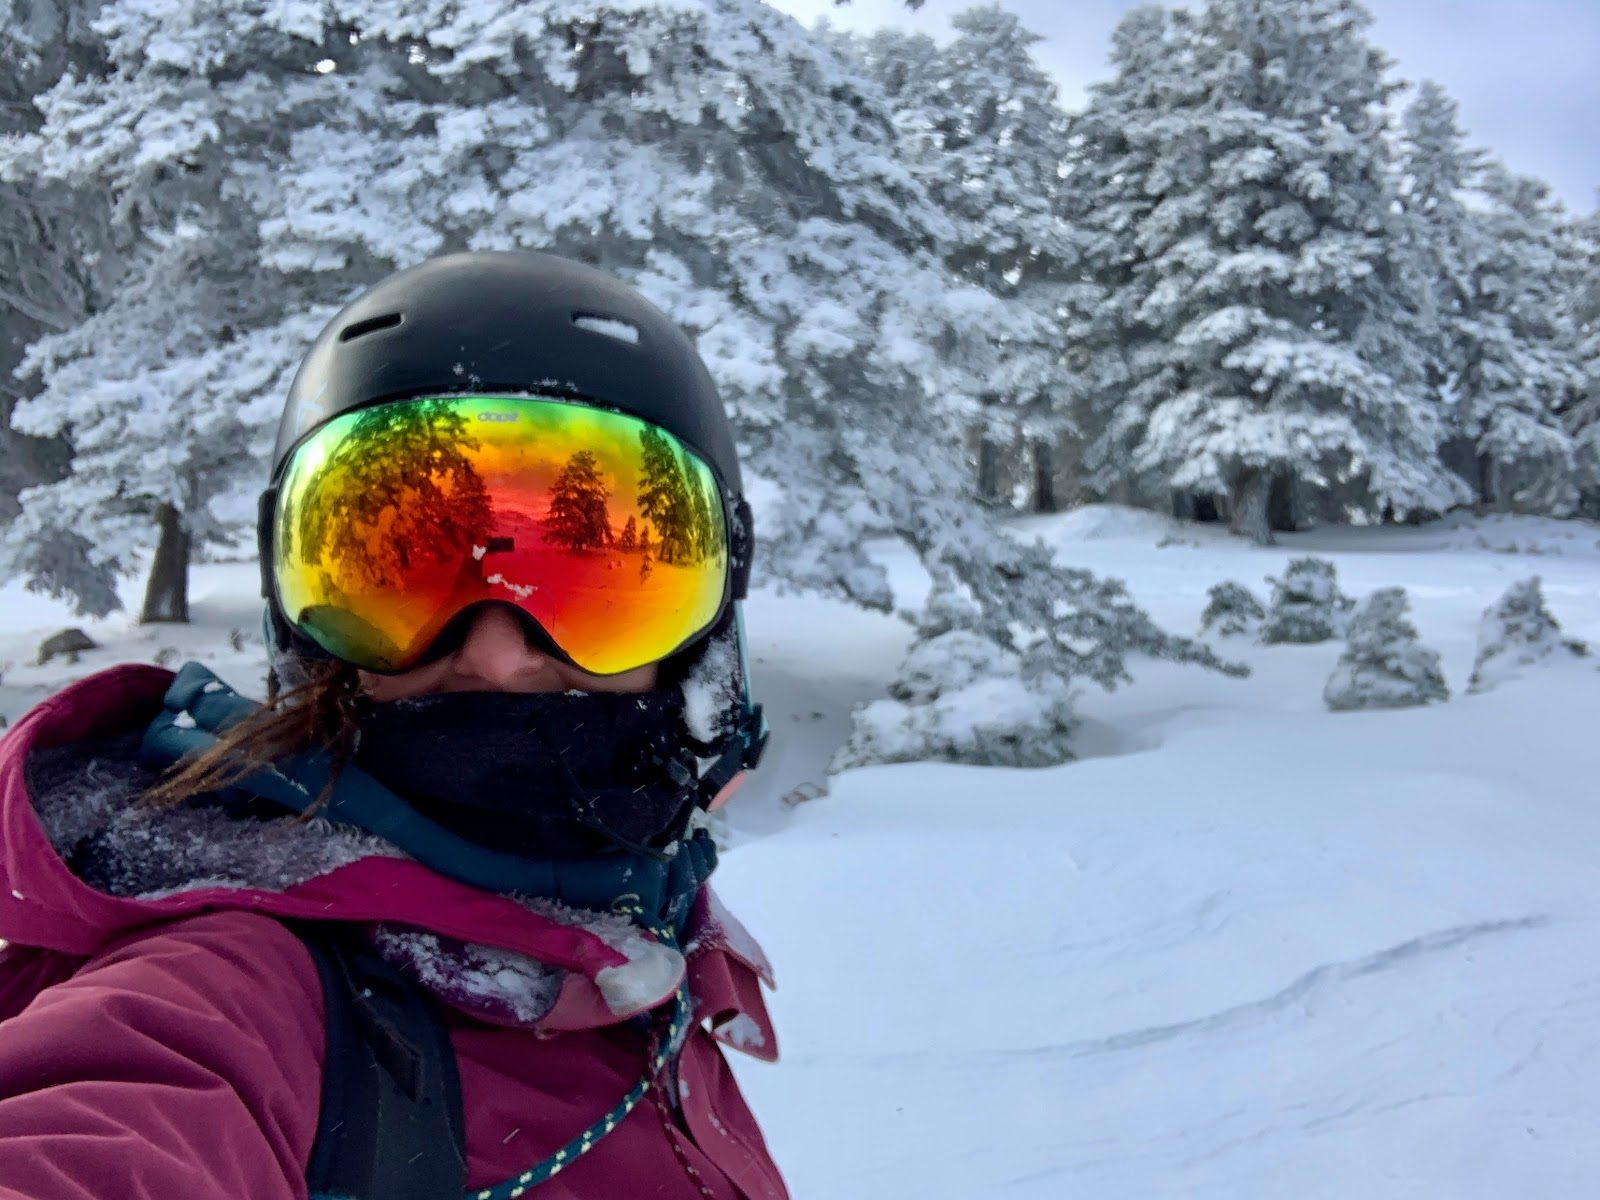 Martina Russo snowboarding in Greece